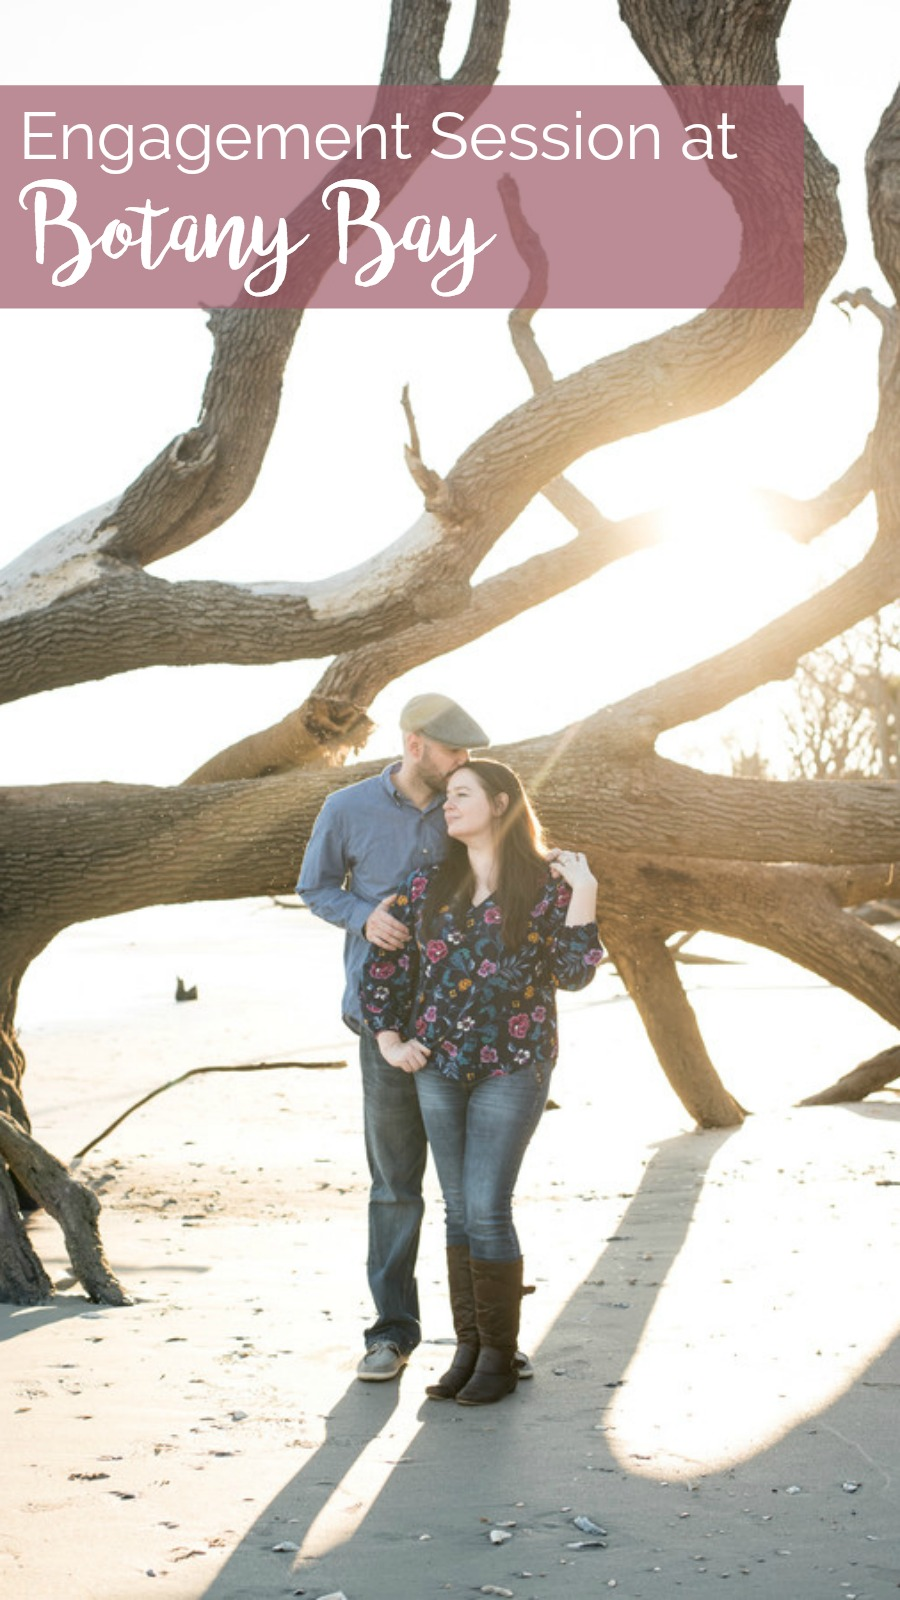 Tara and Travis: Sunset Engagement Session at Botany Bay, Edisto Island, South Carolina | Palmetto State Weddings | The Wedding Click Photography | beachfront weddings | beach engagements | driftwood beach | Southern engagement session